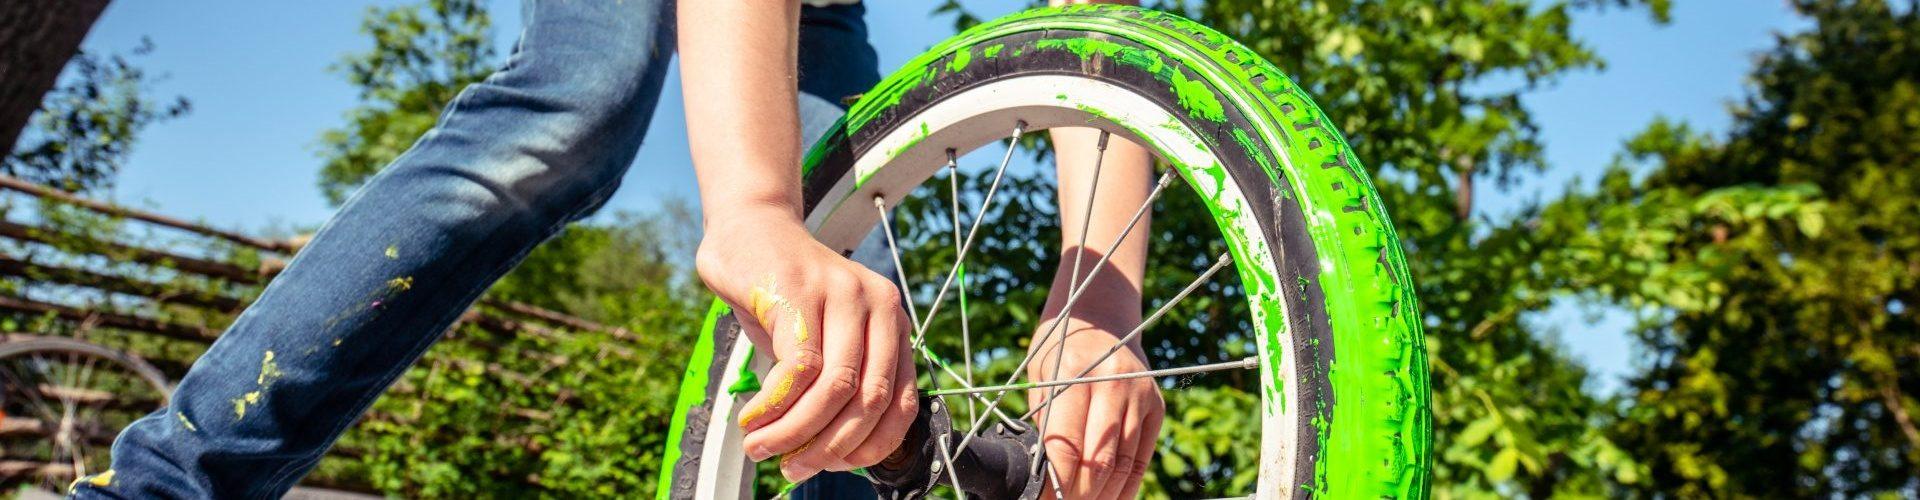 Pige der maler med grøn maling med cykelhjul. Fotograf Steen Knarberg